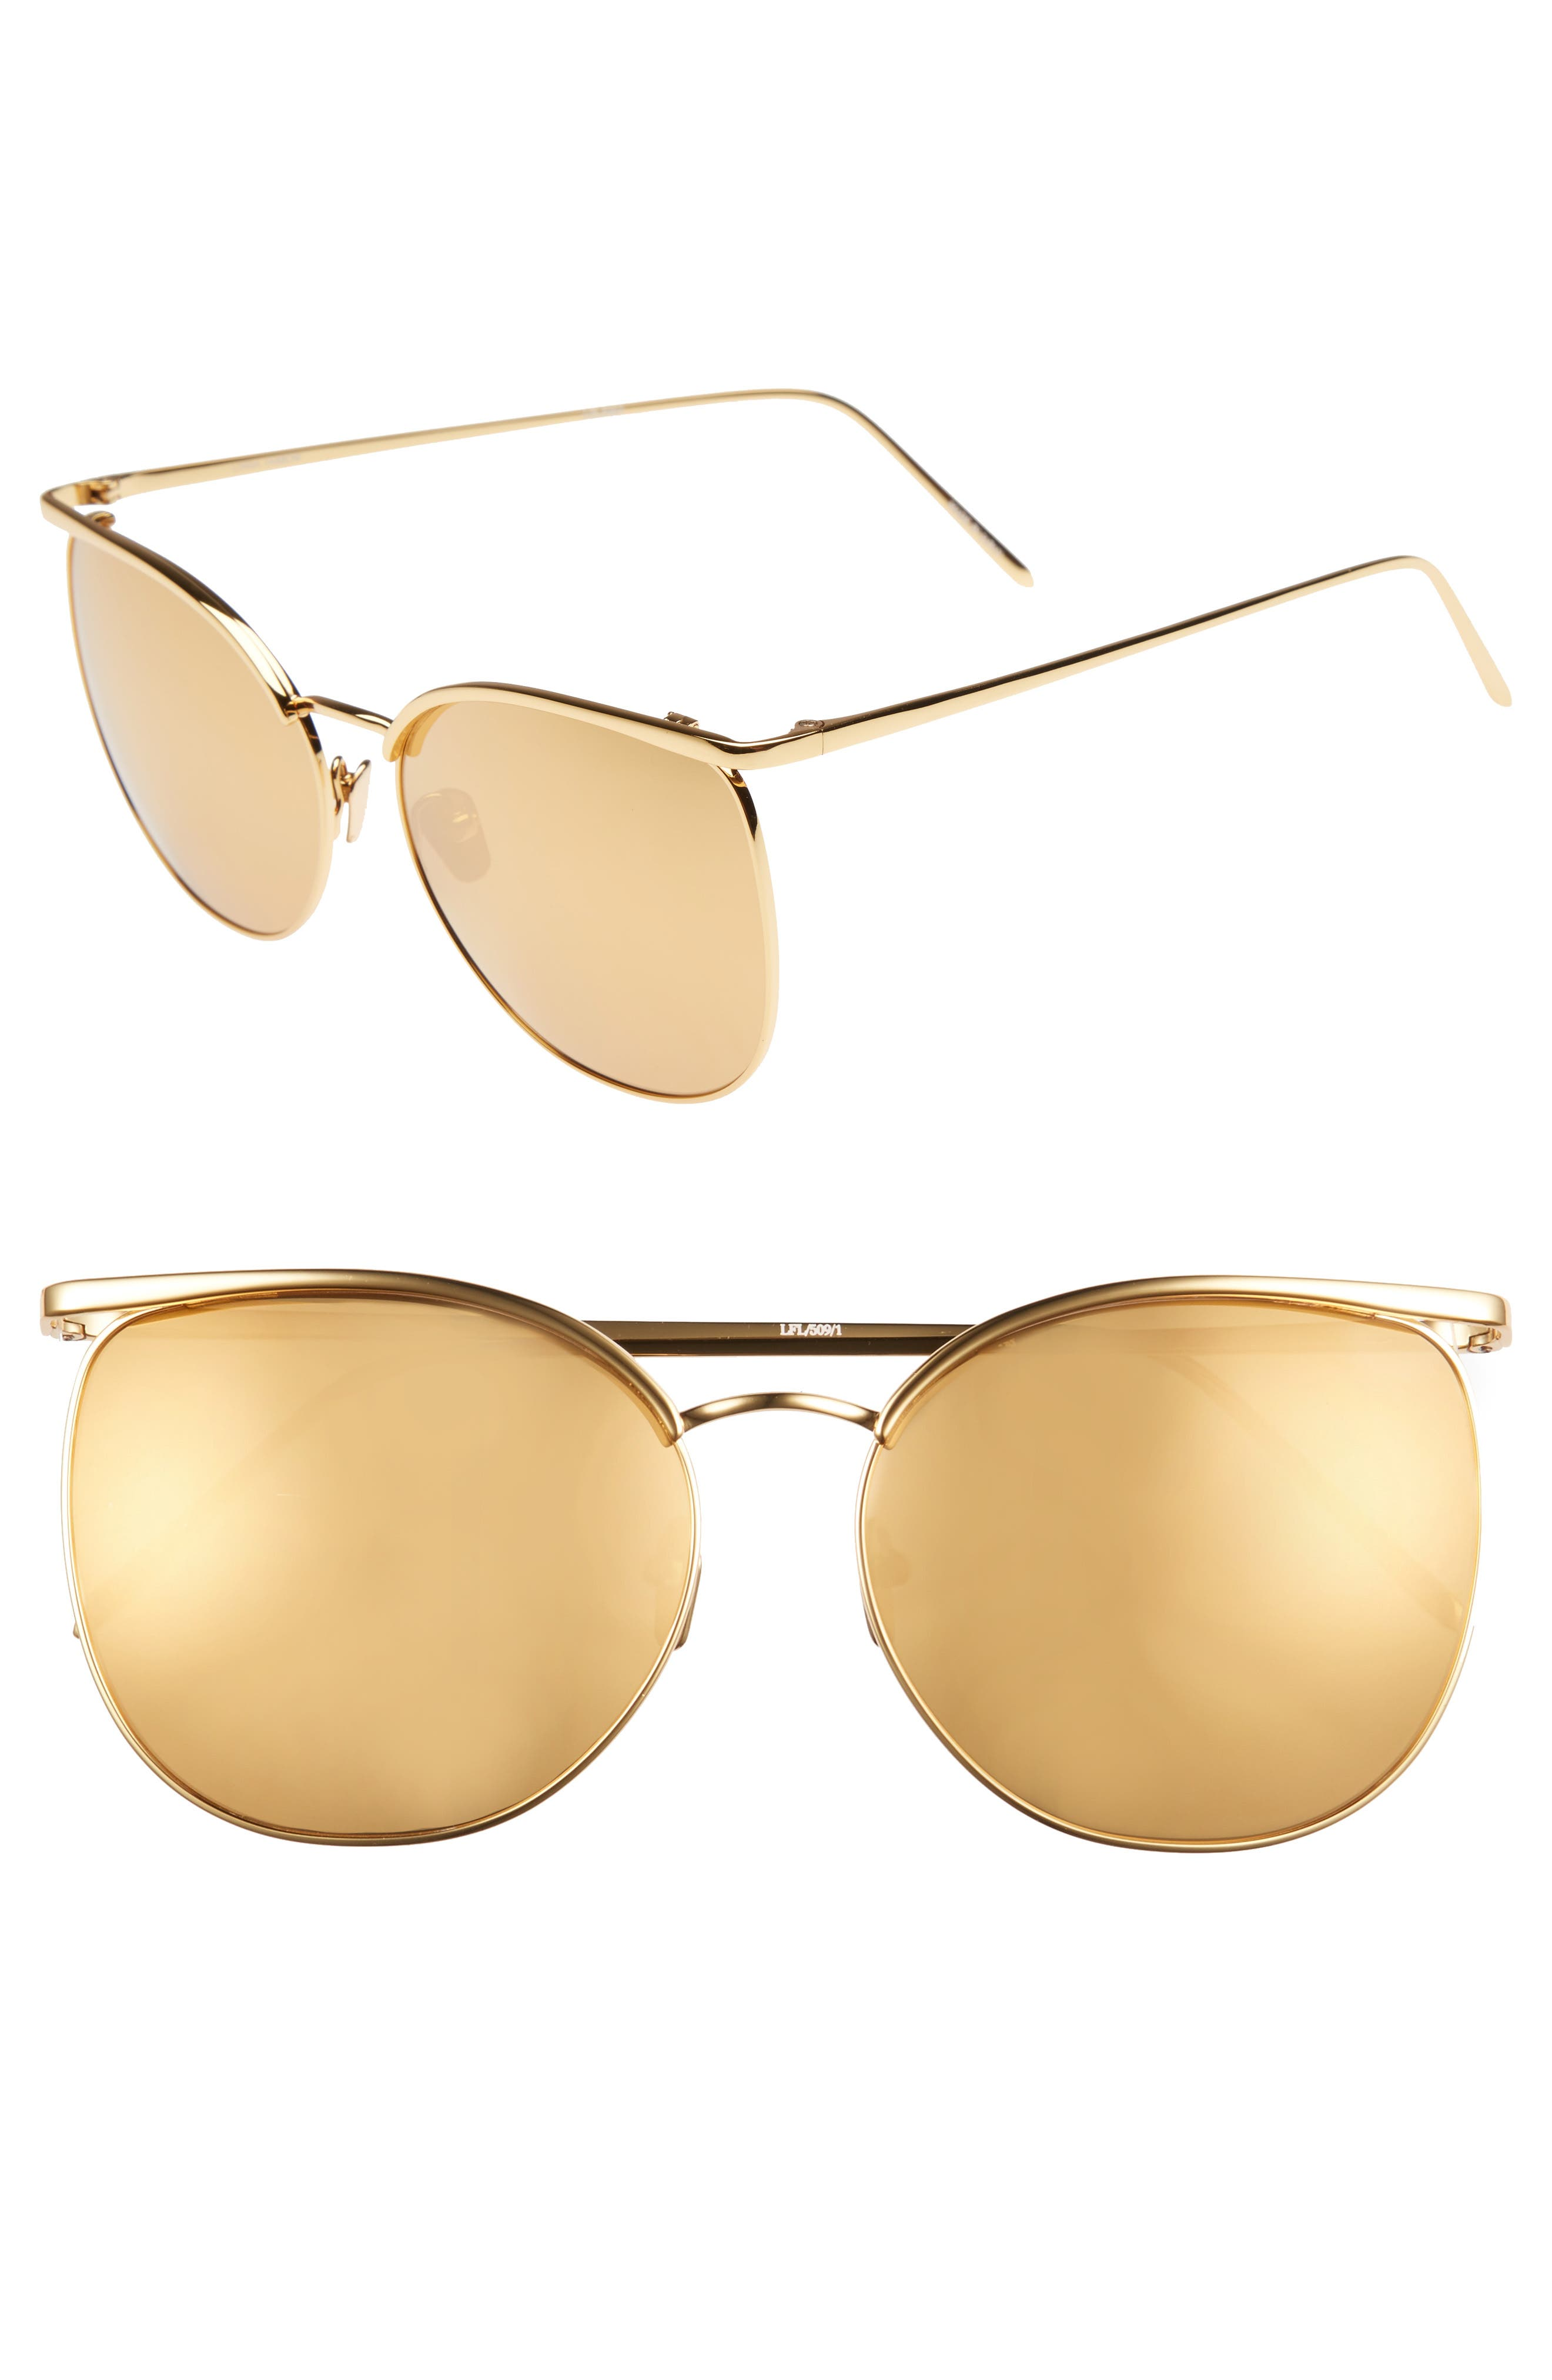 Main Image - Linda Farrow 59mm Mirrored 22 Karat Gold Trim Sunglasses